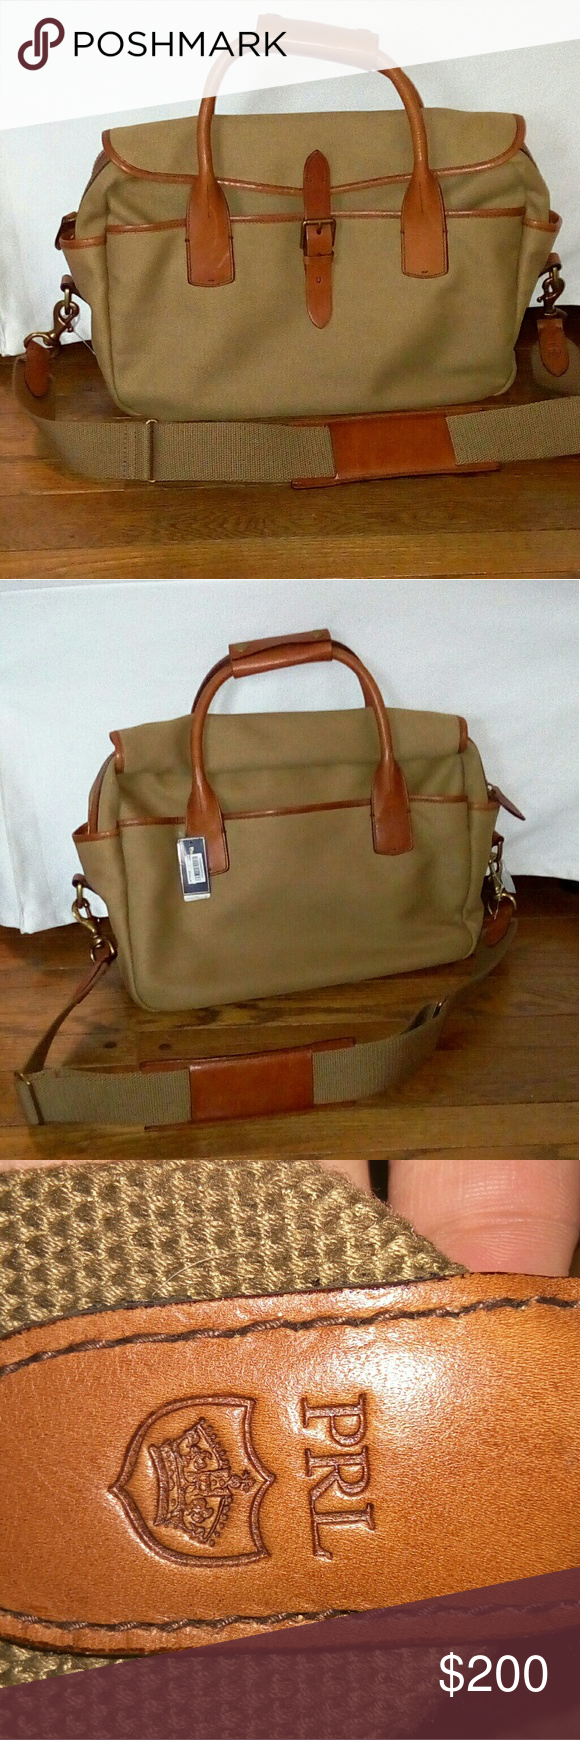 I just added this listing on Poshmark  NWT Ralph Lauren Laptop Bag.   shopmycloset  poshmark  fashion  shopping  style  forsale  Ralph Lauren   Handbags 067831bebc